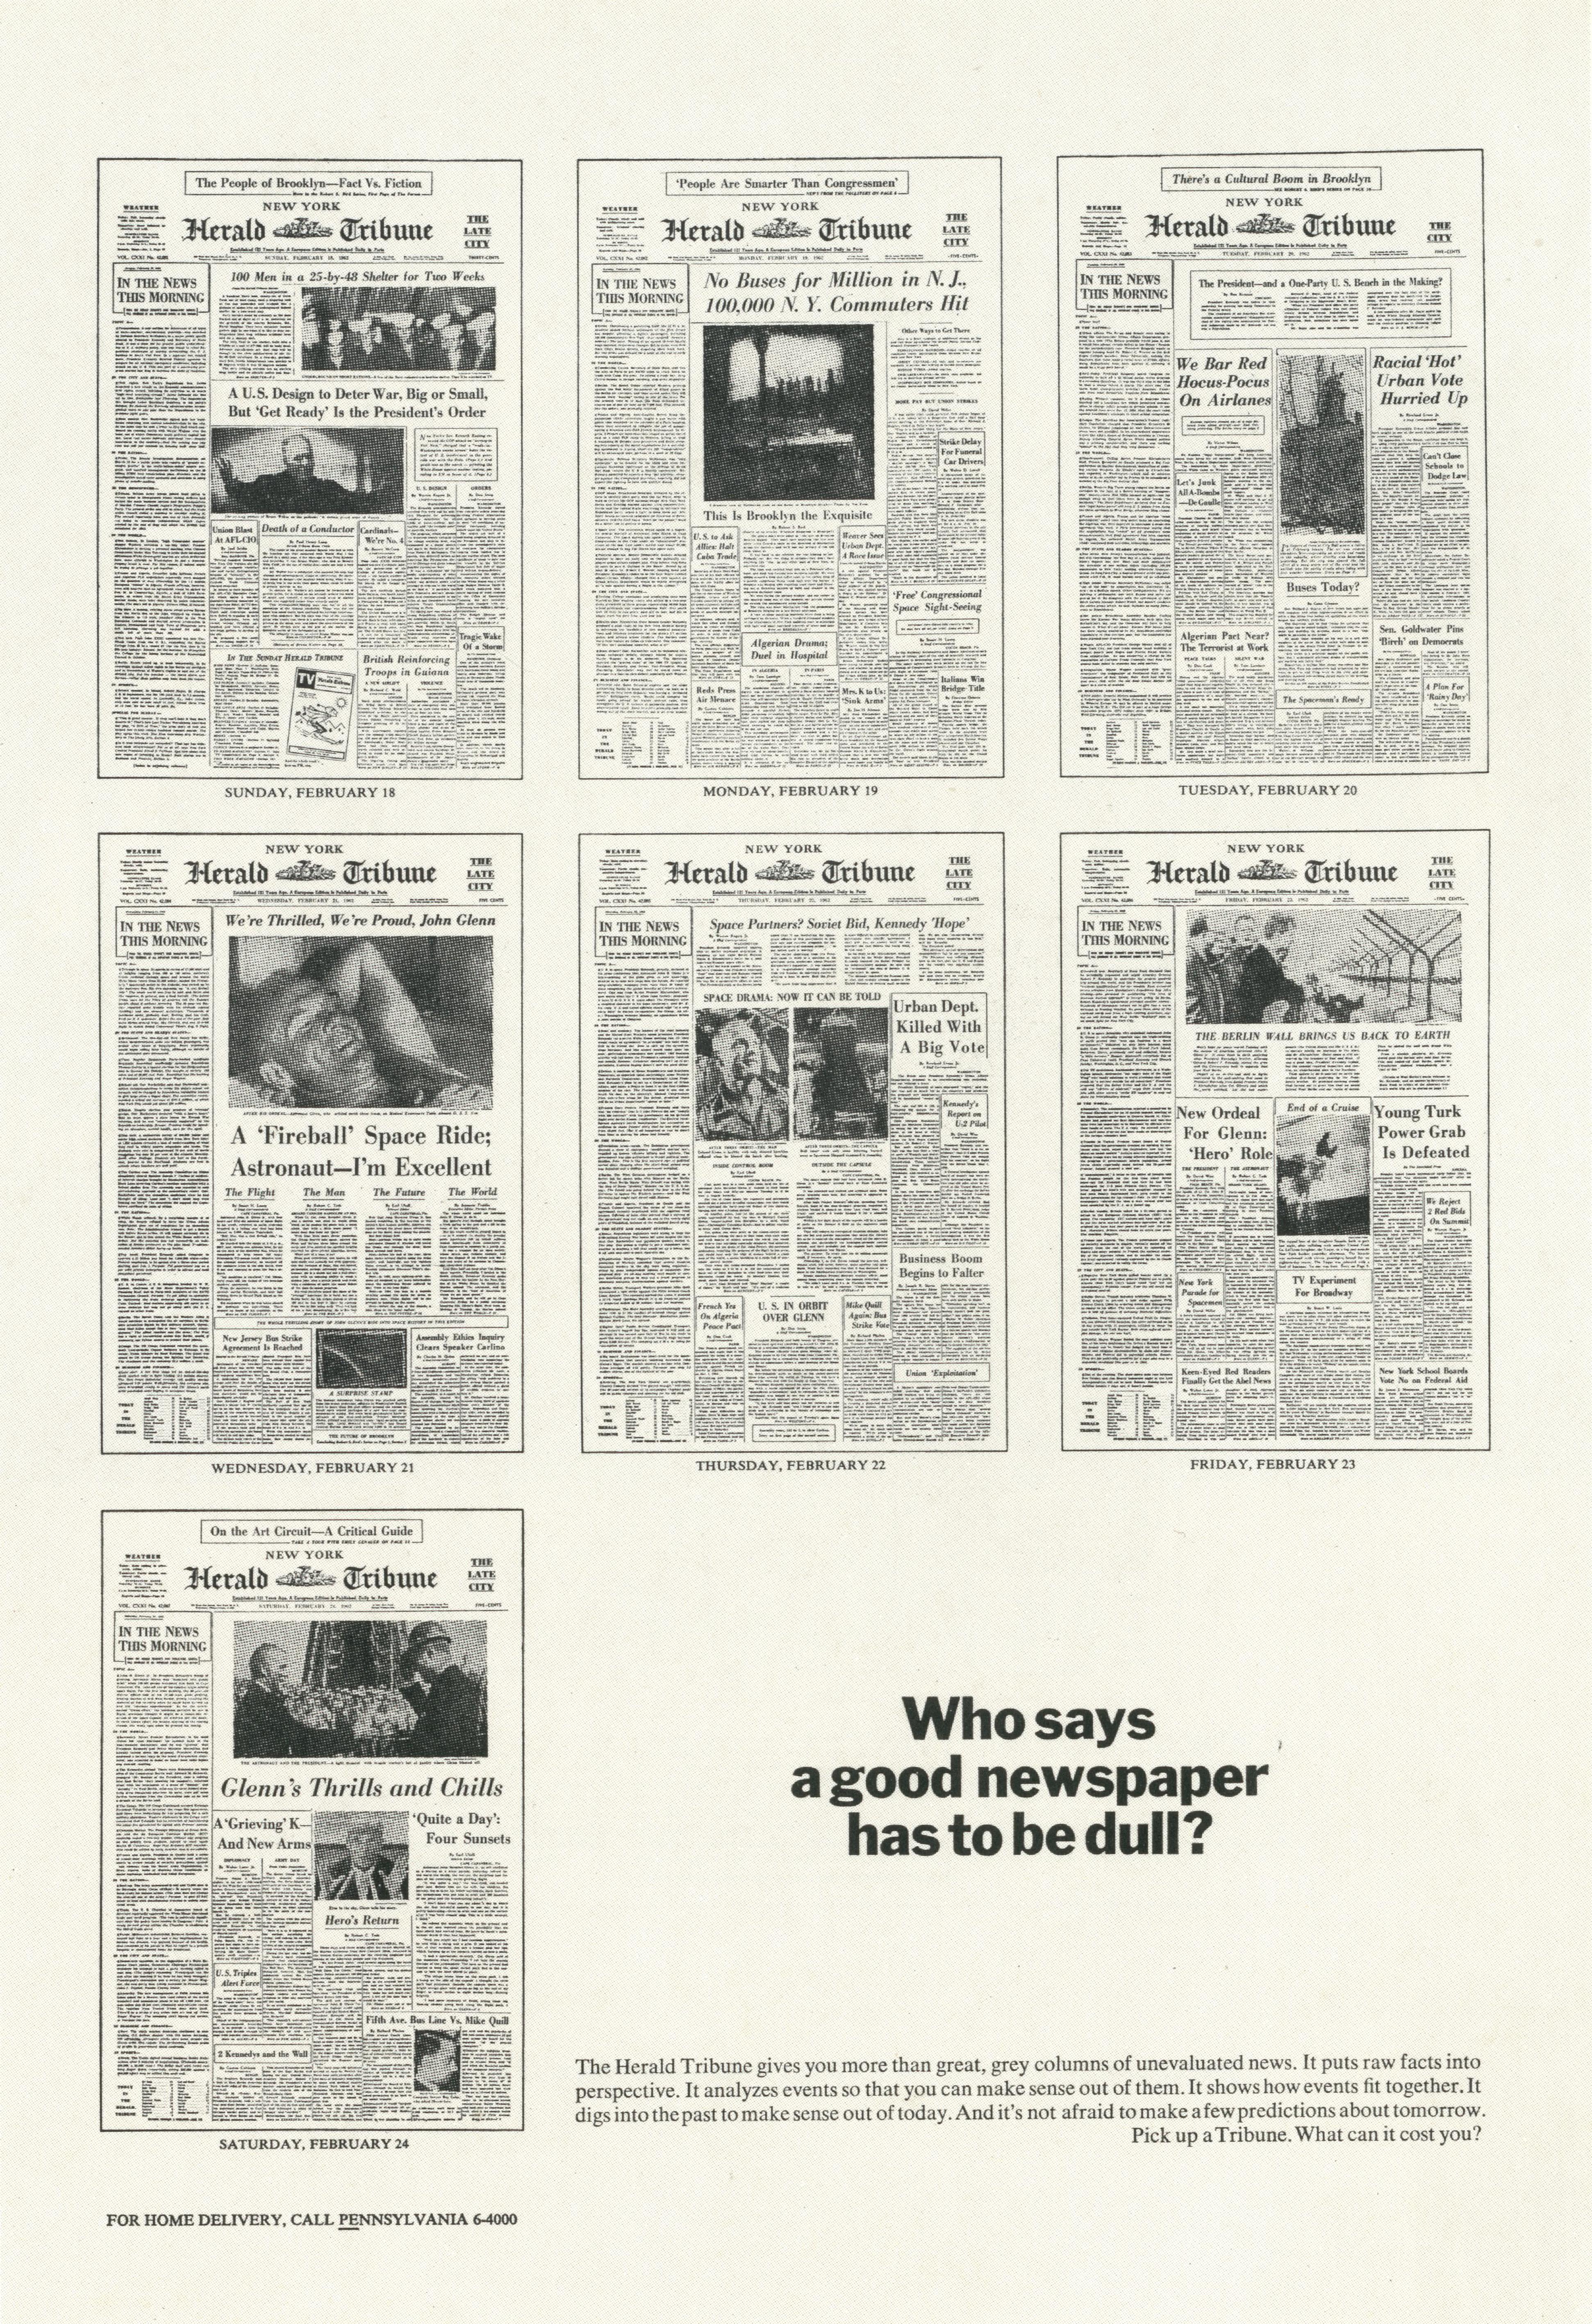 PKL2; Herald Tribune 'Dull:Front Pages'